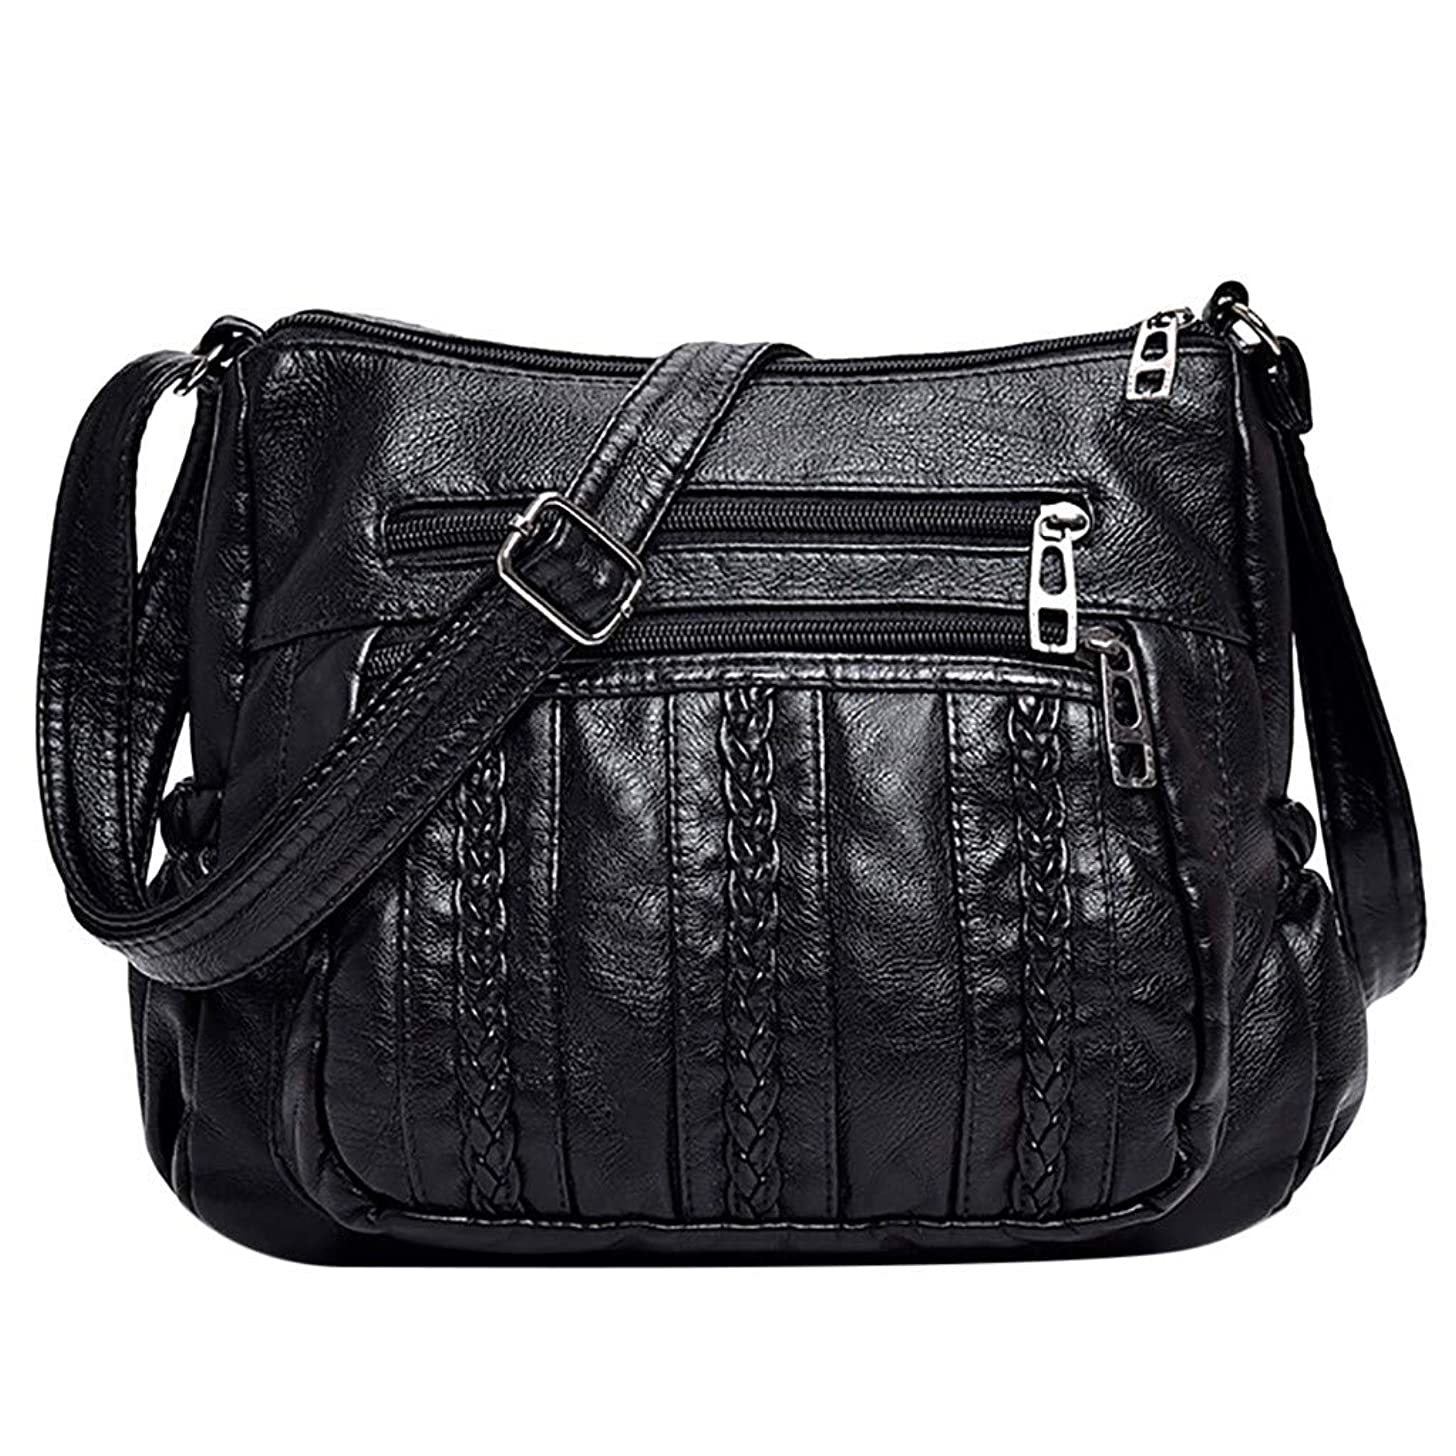 Muti-Pocket Anti-Theft Messenger Bag, Leather PU Shoulder Bag Large Capacity Crossbody Bag with Adjustable Strap by Vielgluck